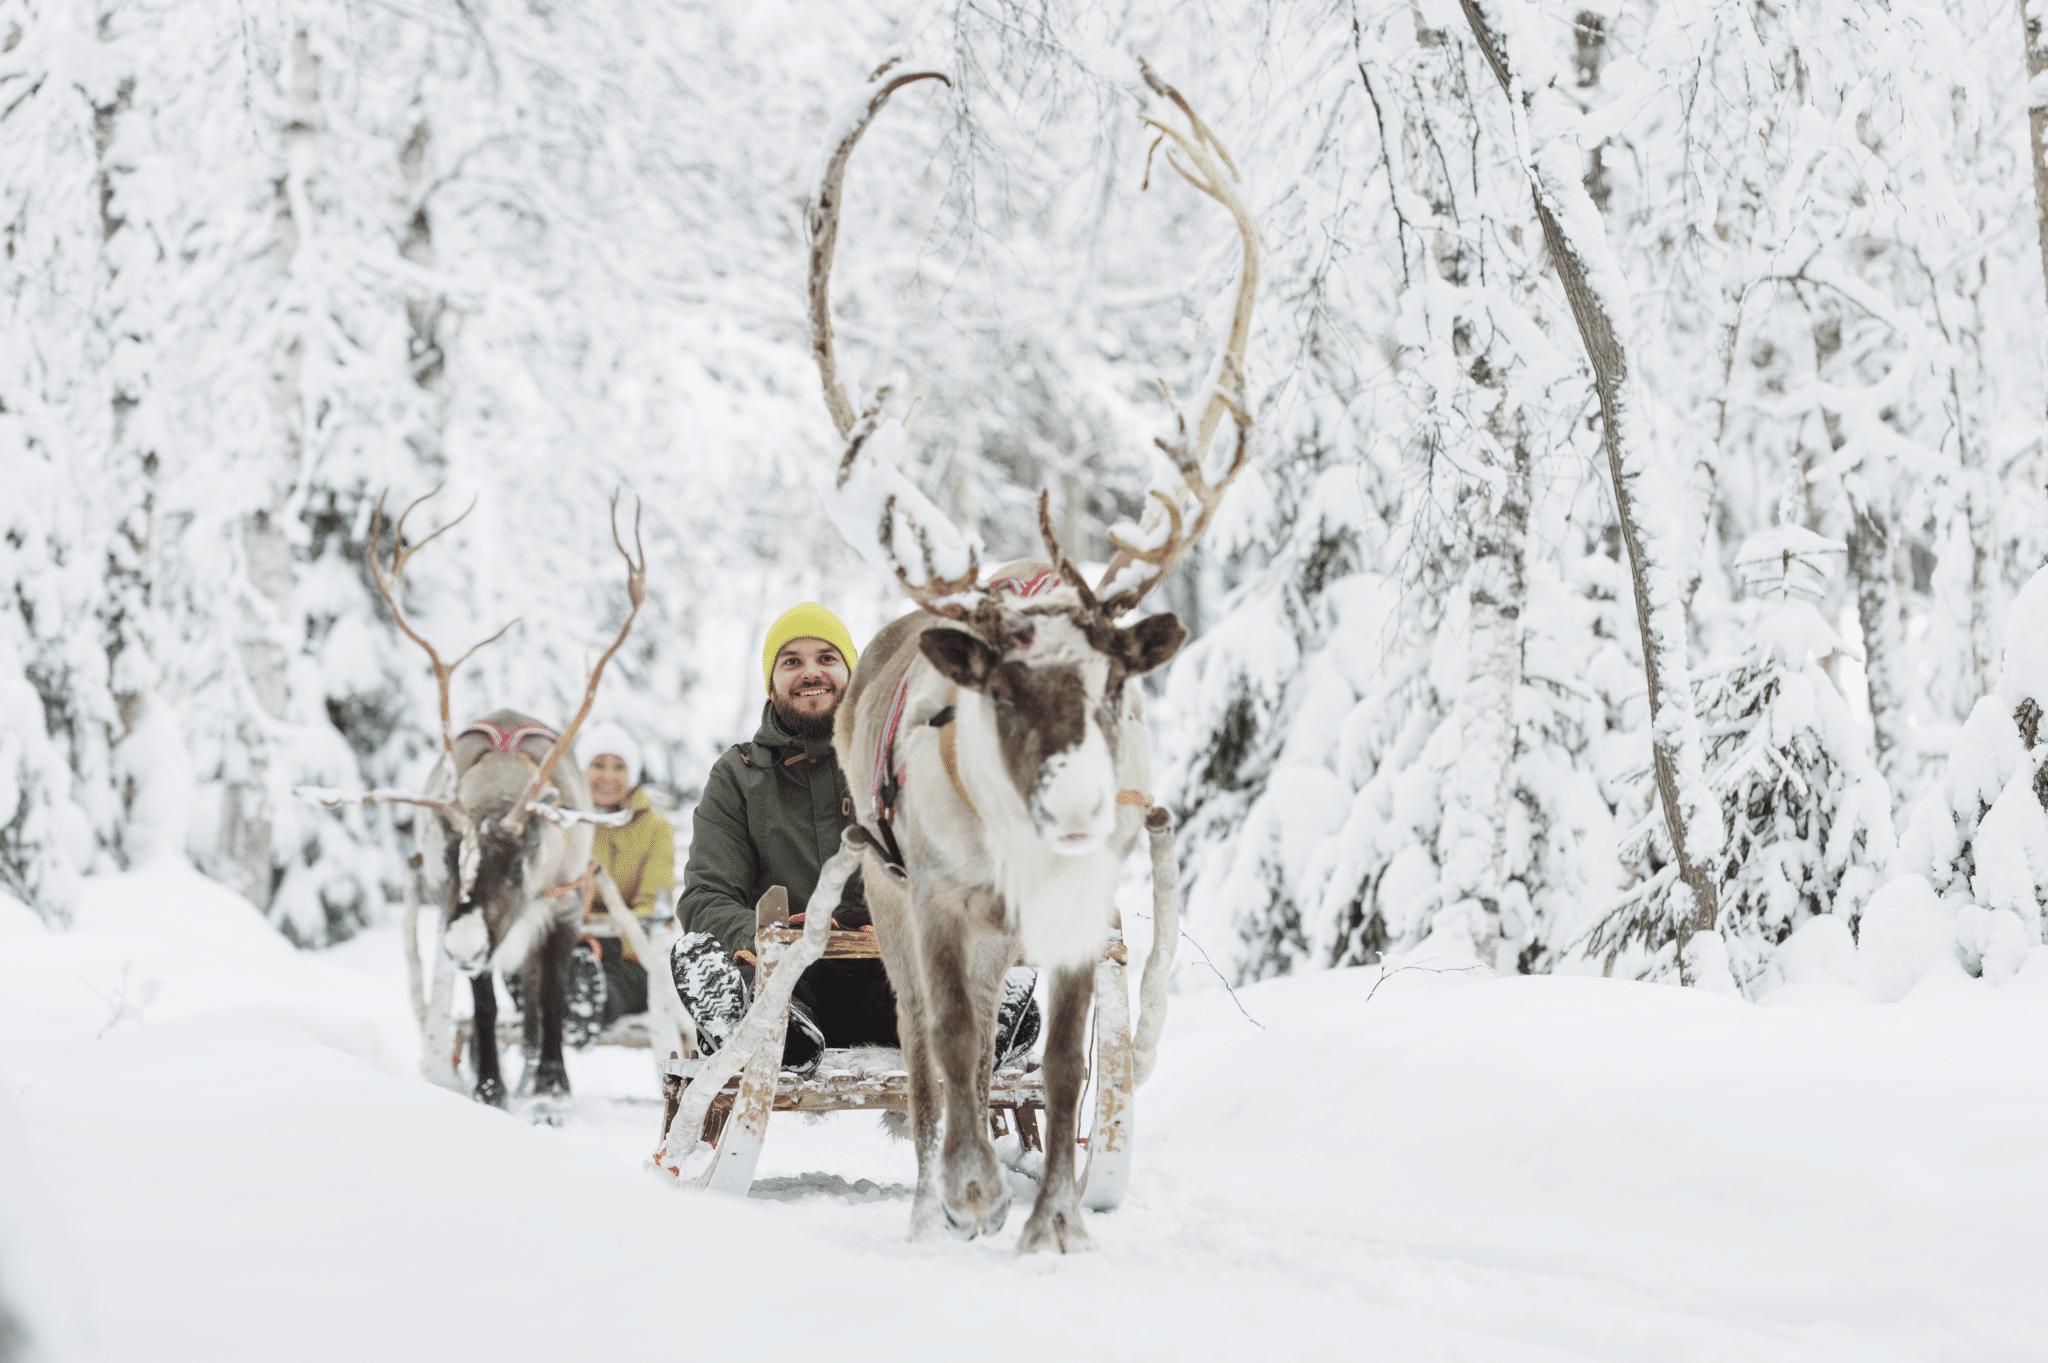 Rentierschlitten ©Juho Kuva